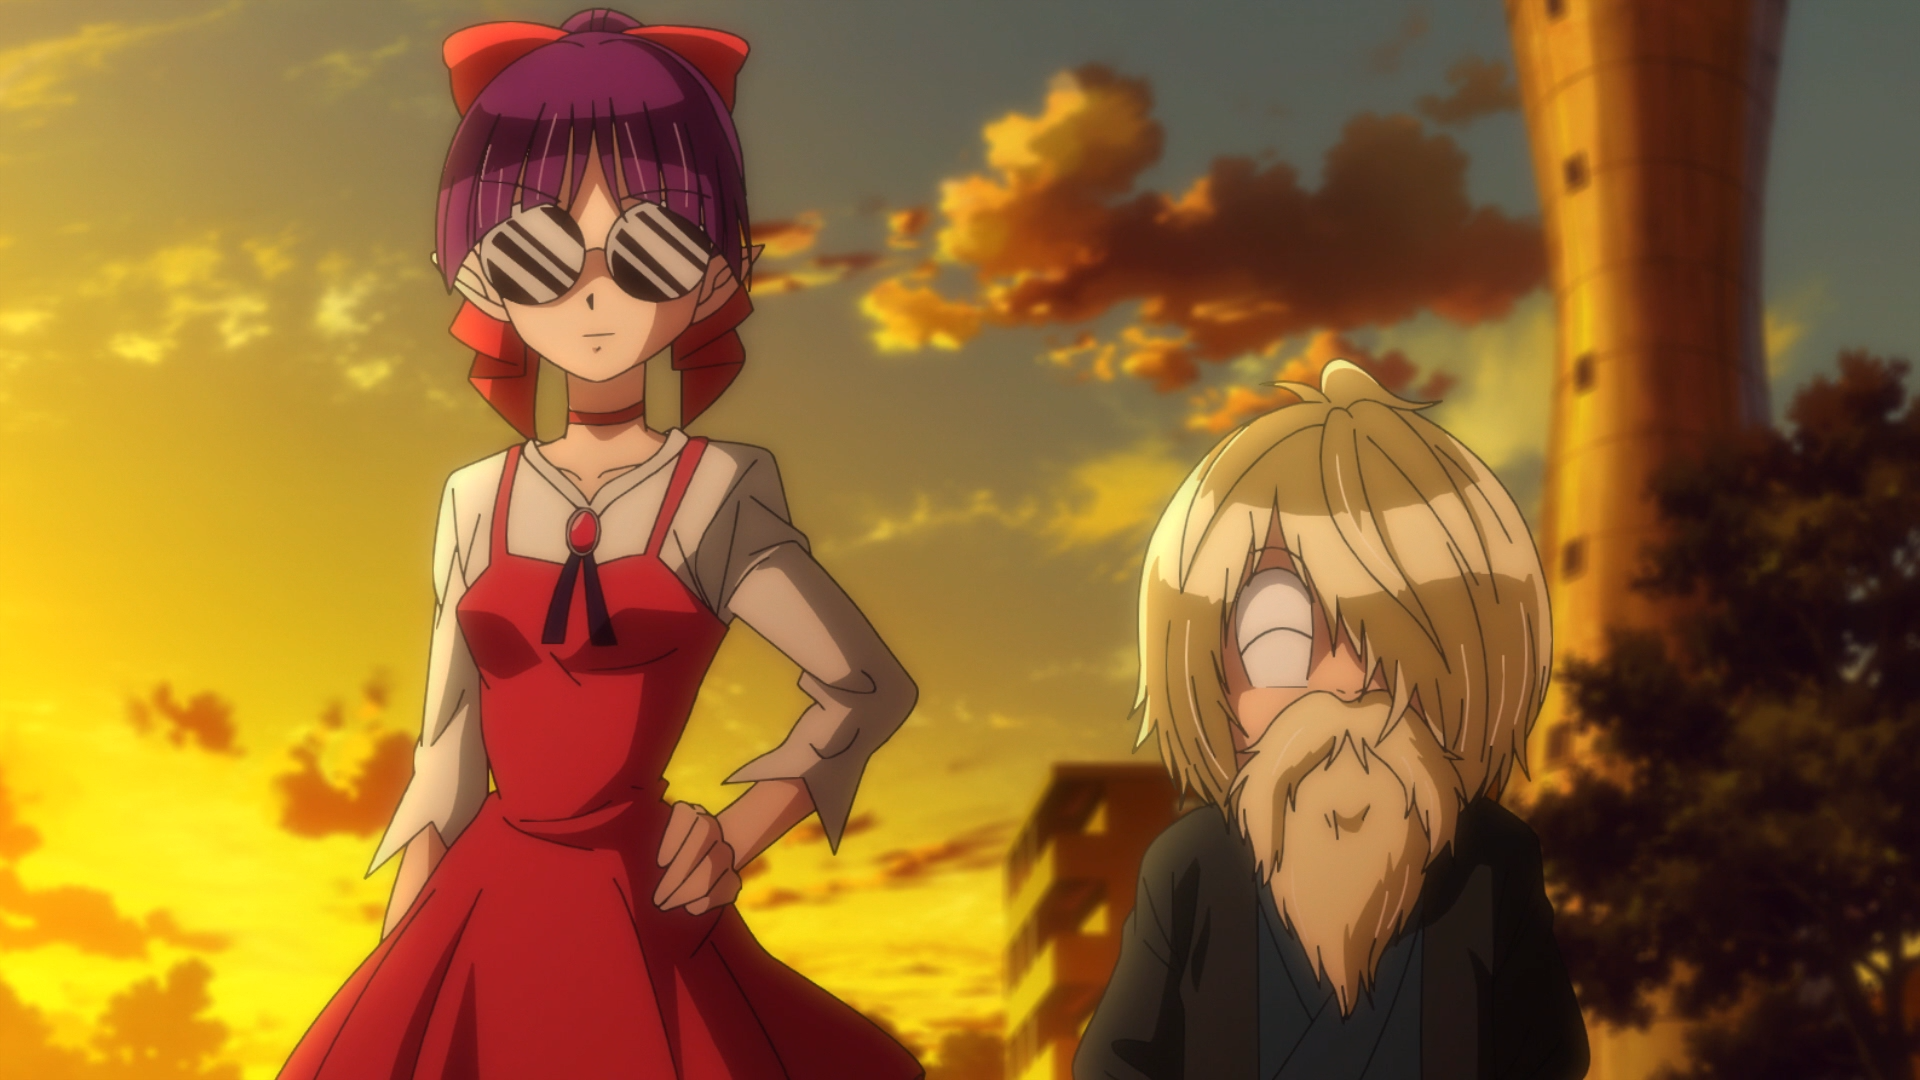 Header image showing Kitaro and Neko Musume in disguise